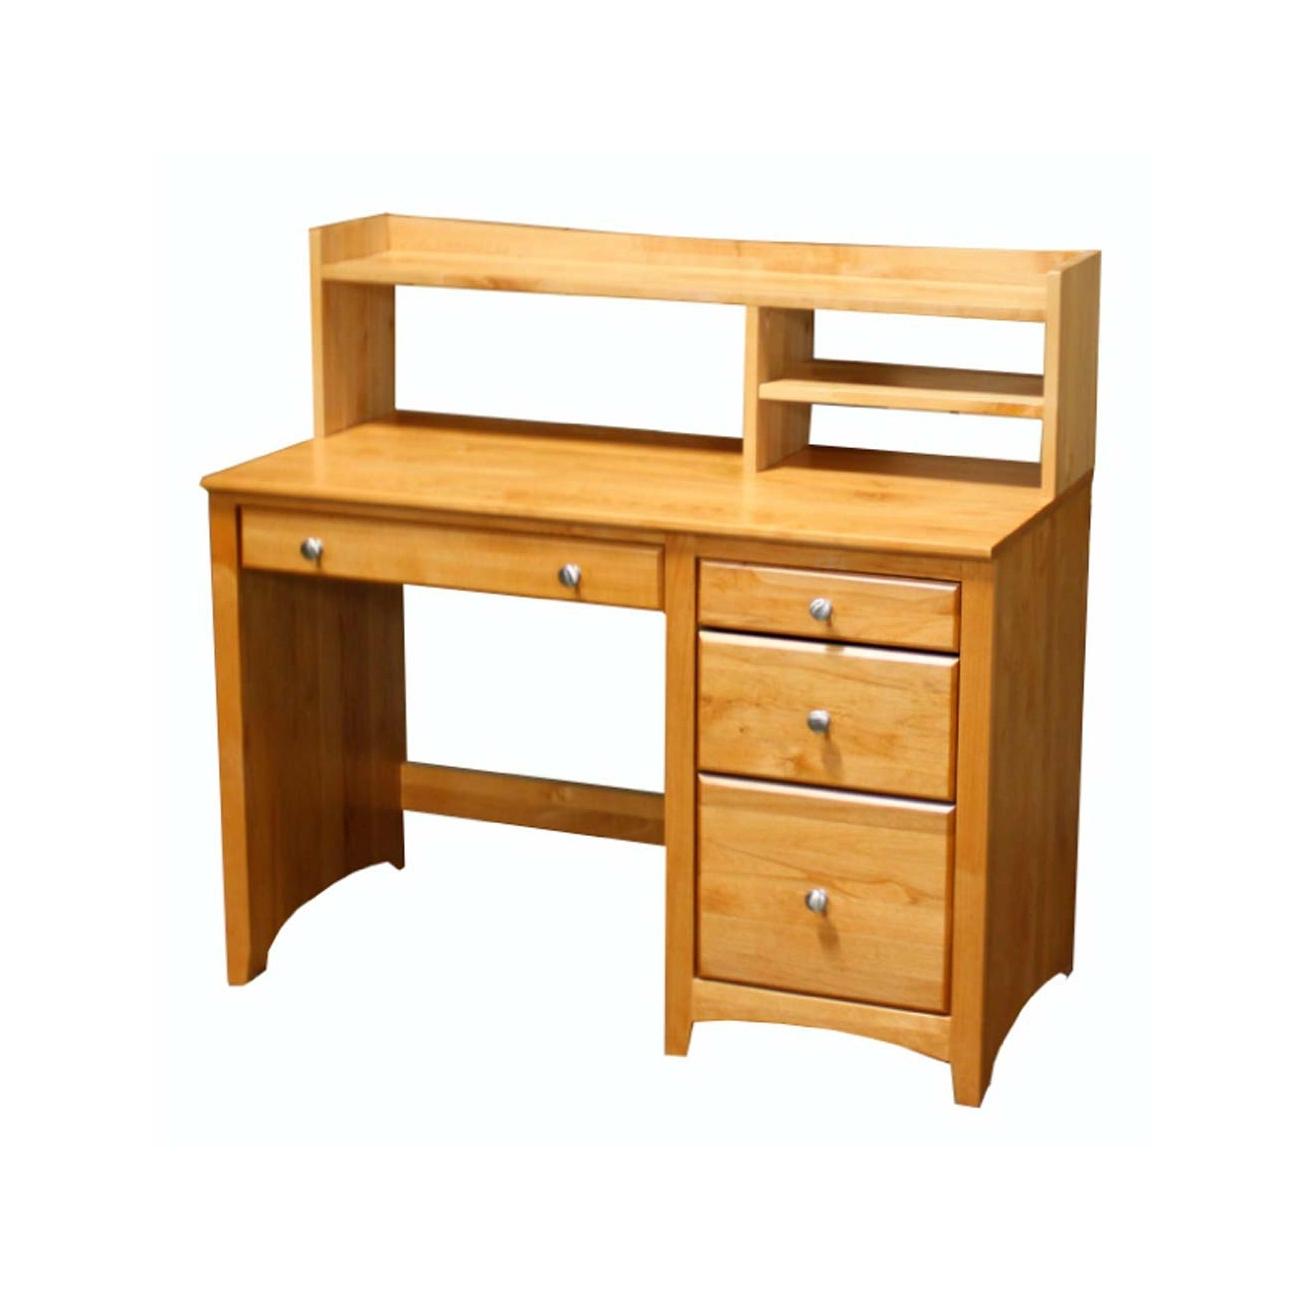 desk hutch - Archbold - 4 drawer desk and 45w student desk hutch modular office - Finished.jpg